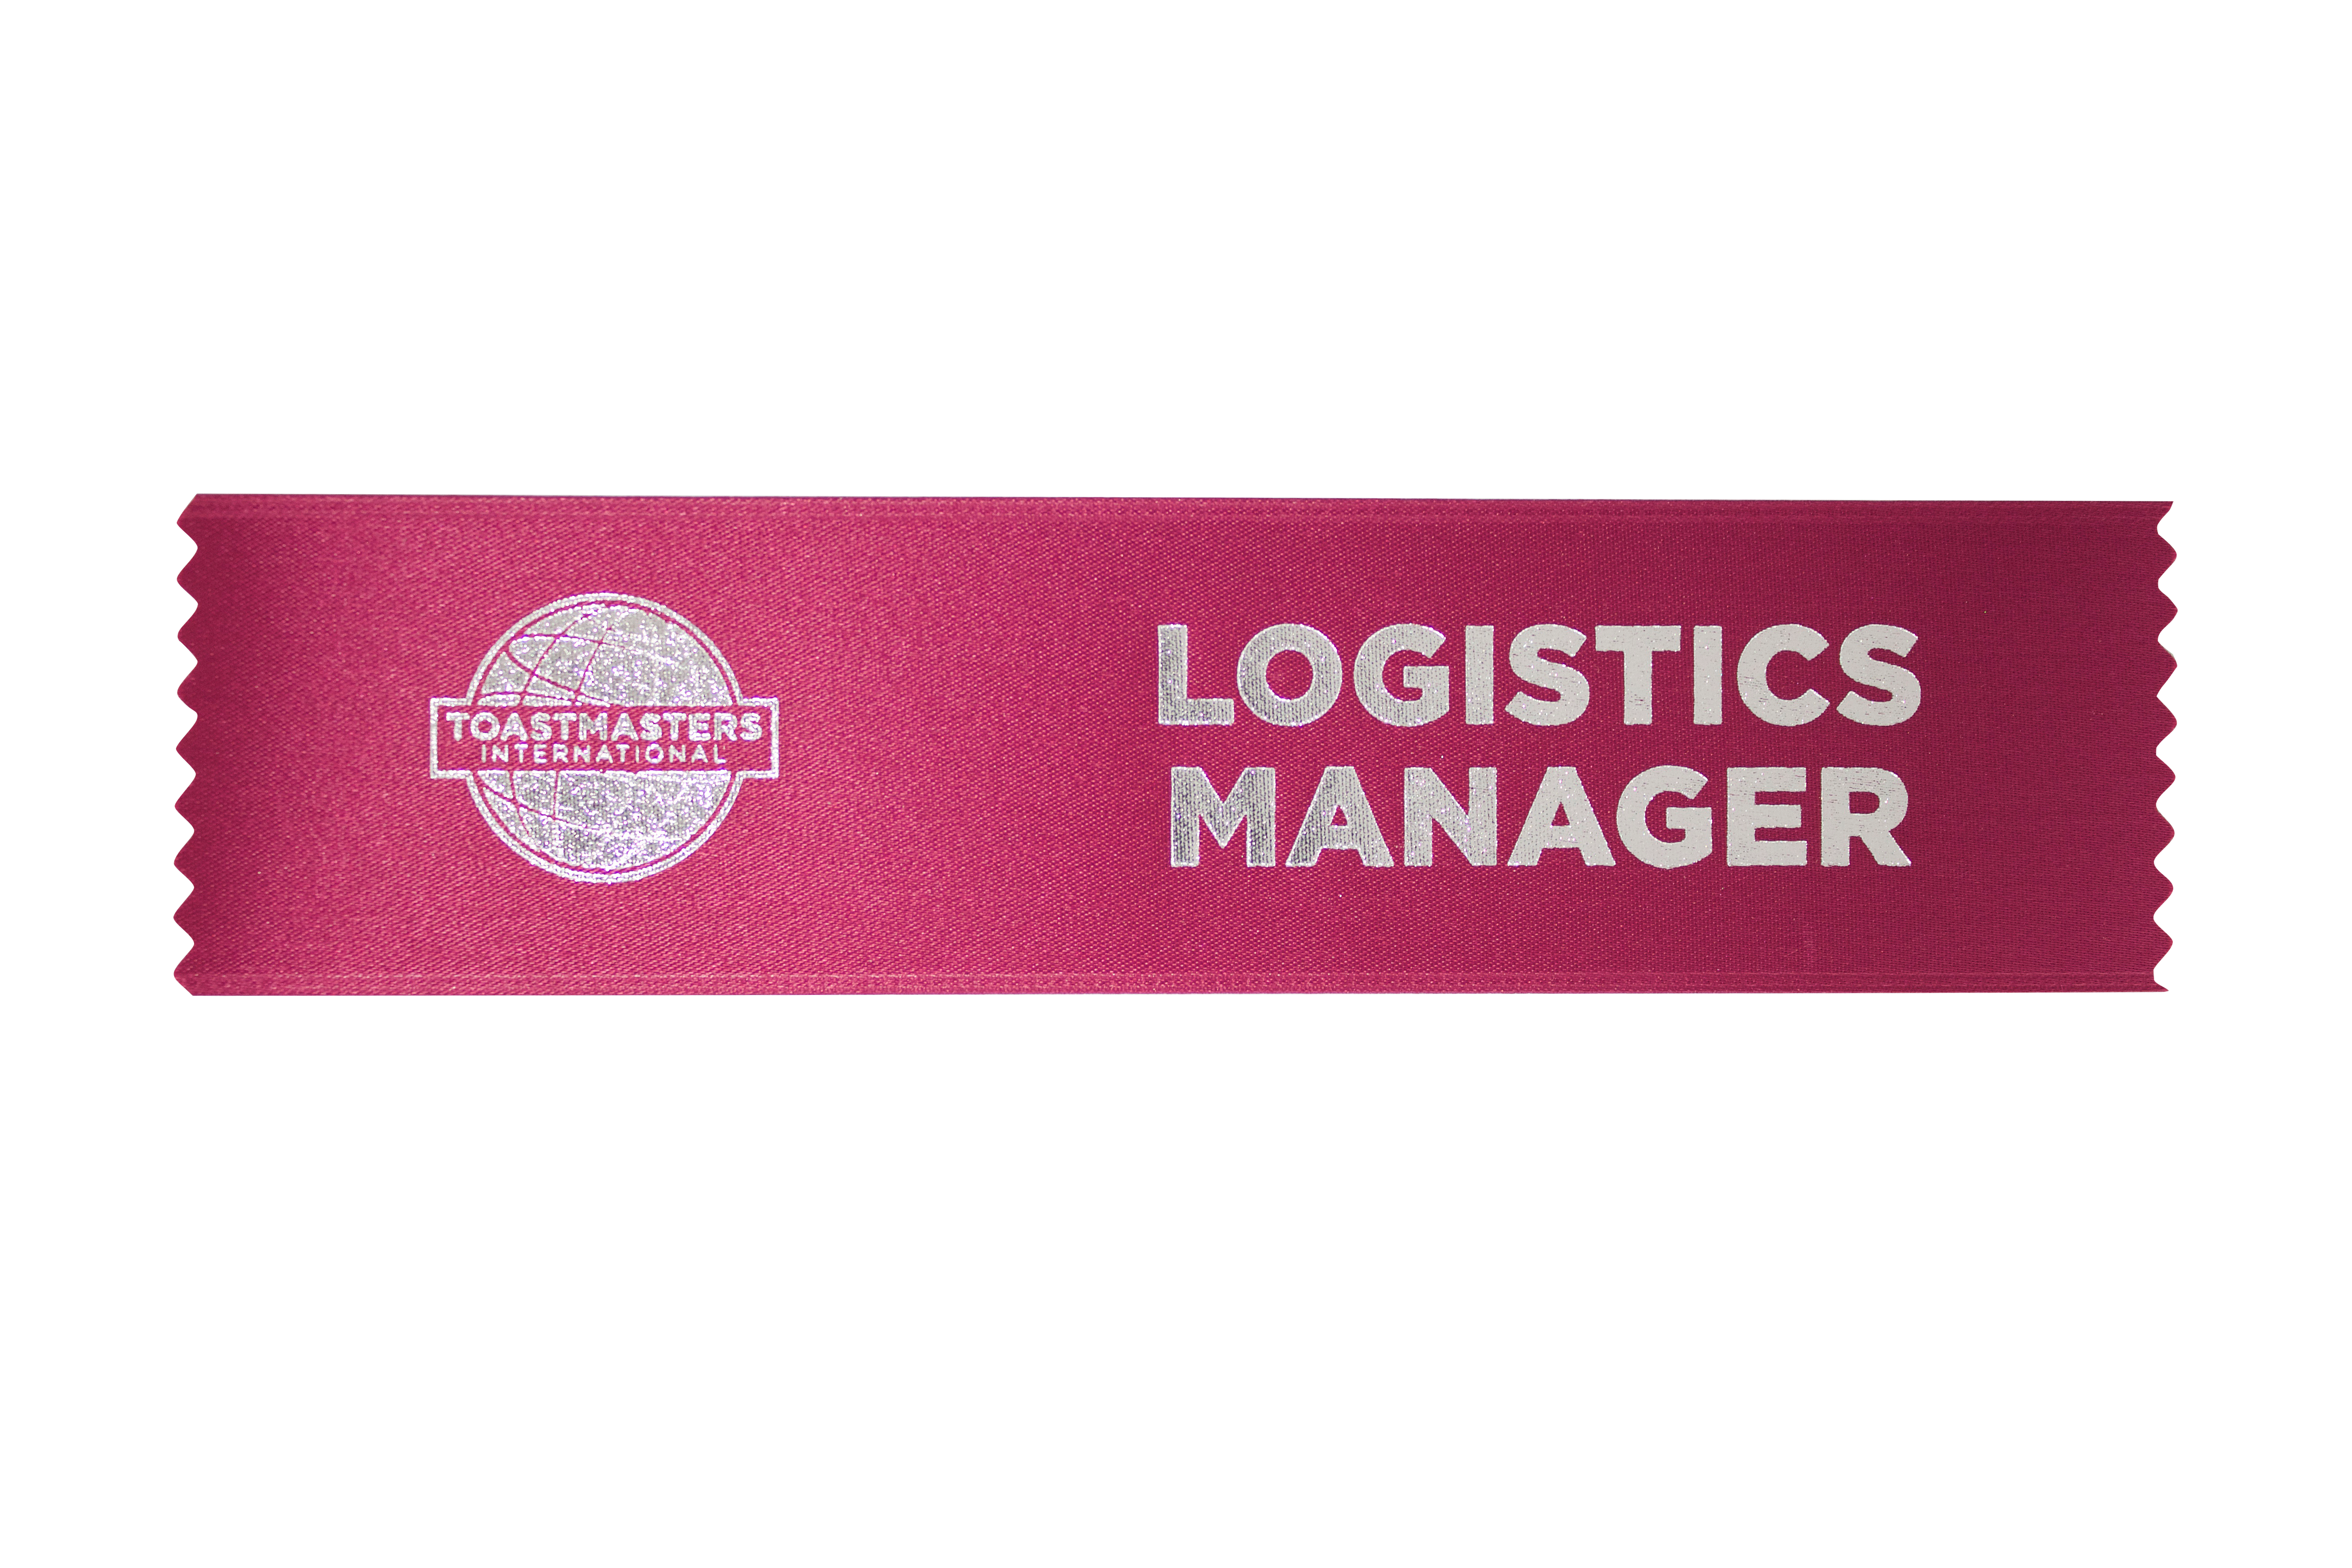 Logistics Manager Ribbon